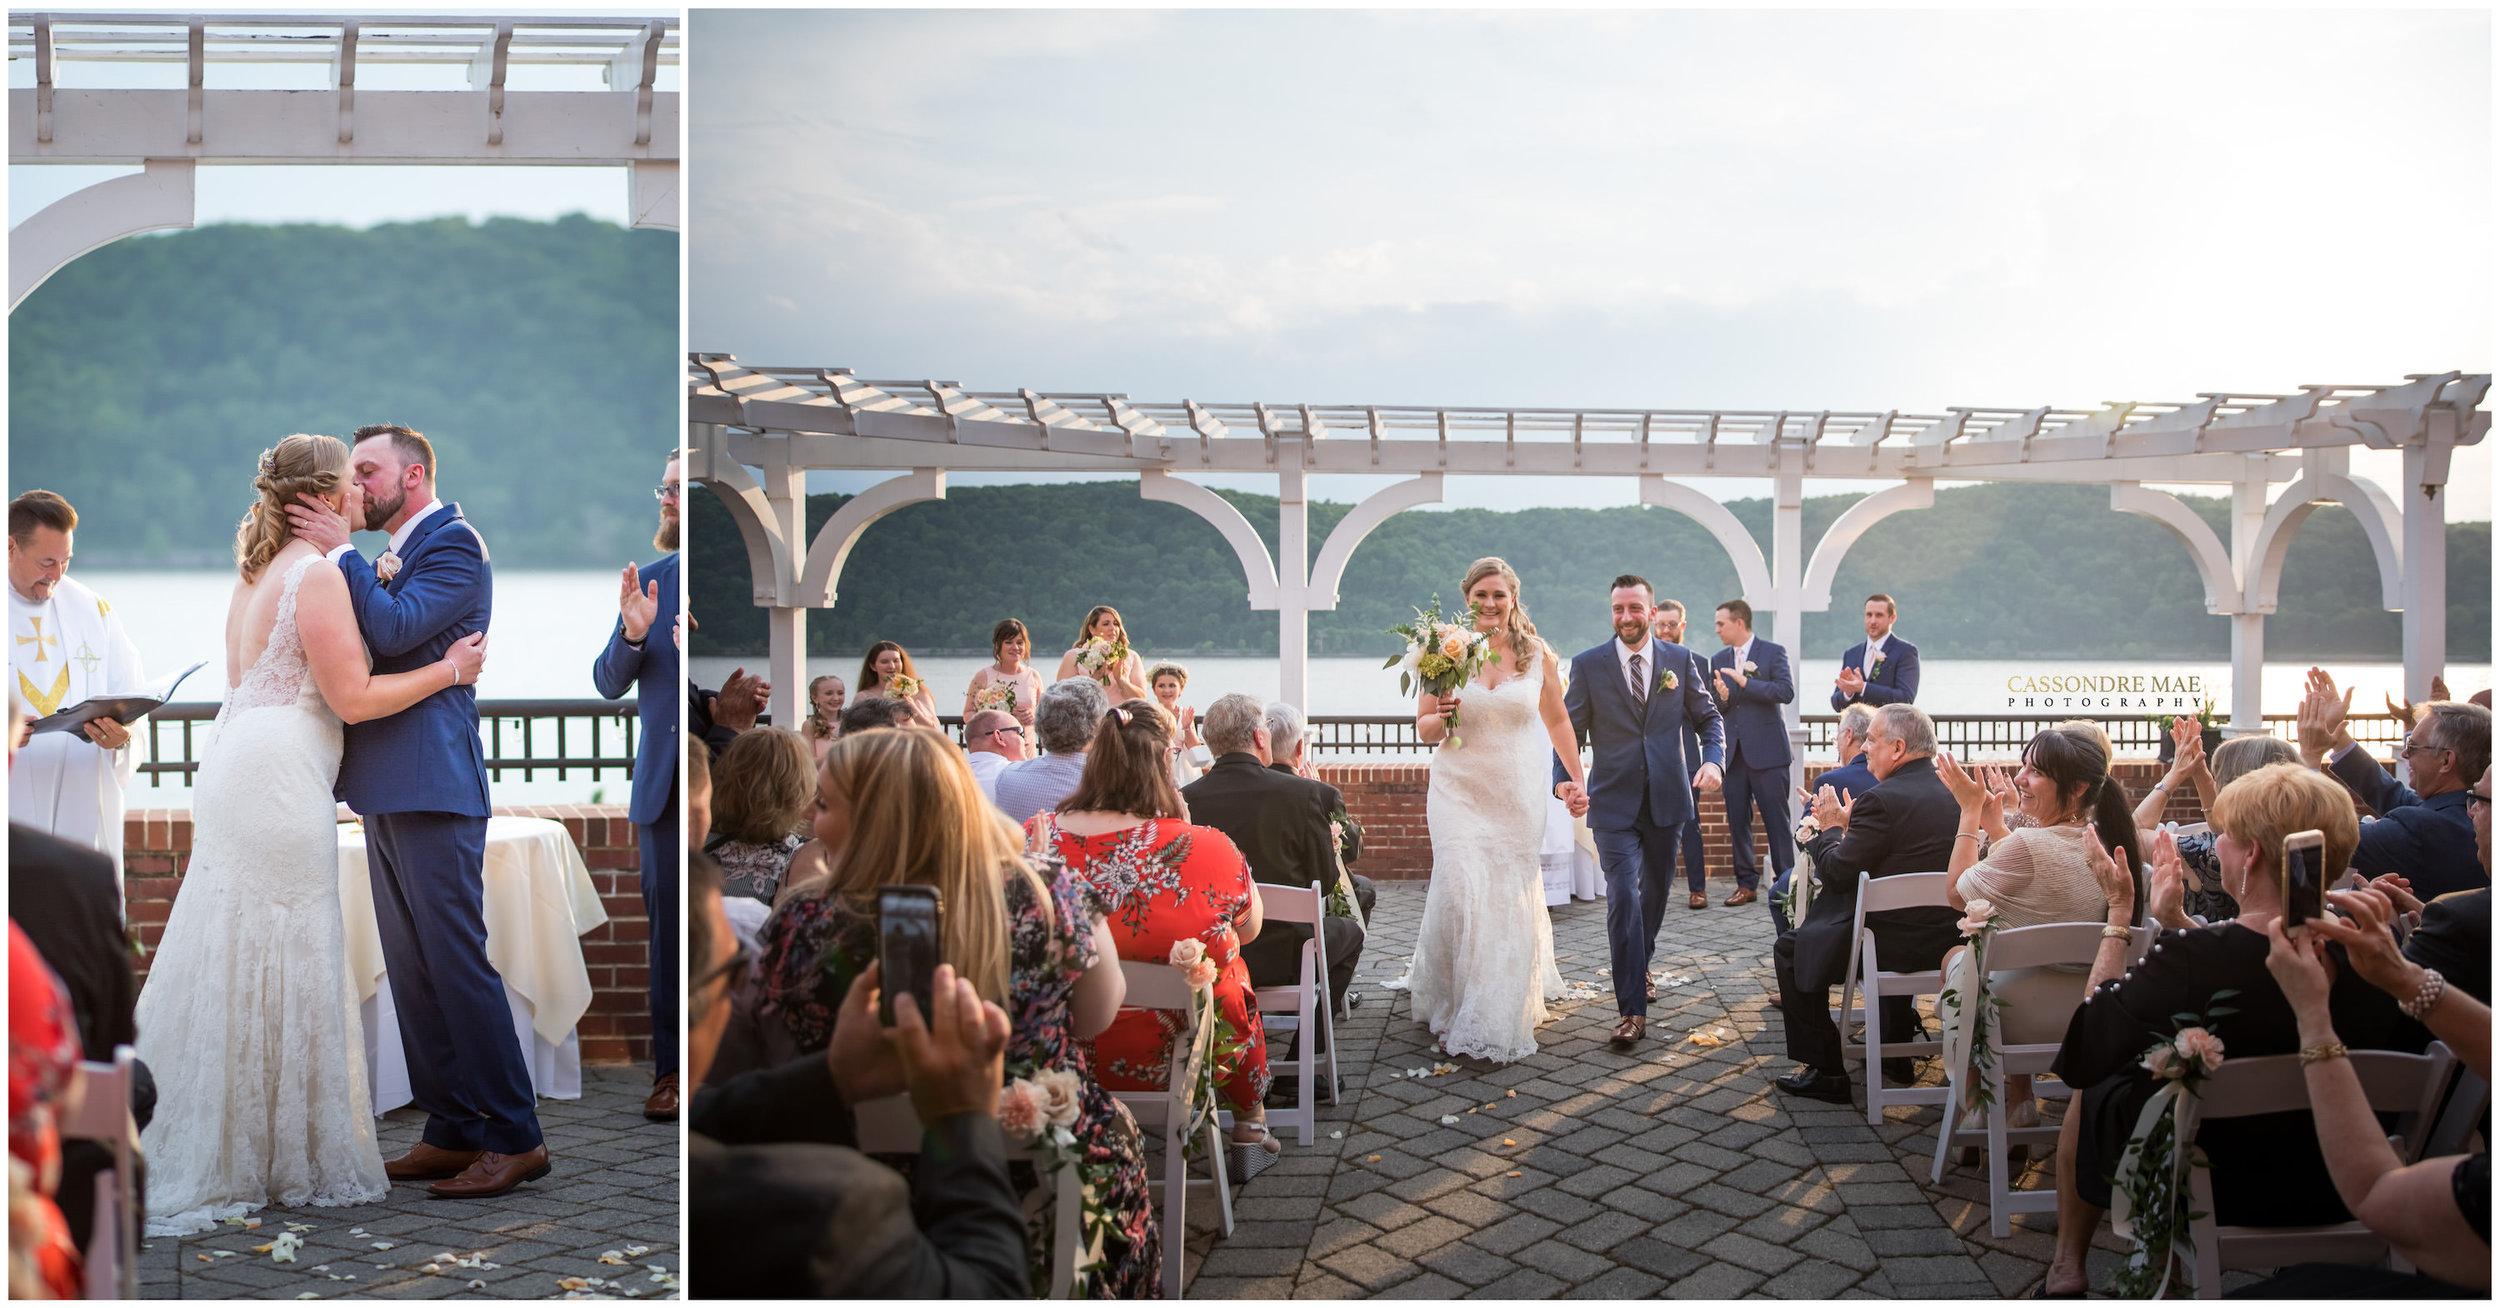 Cassondre Mae Photography Grandview Wedding Photos Poughkeepsie NY Hudson Valley 15.jpg